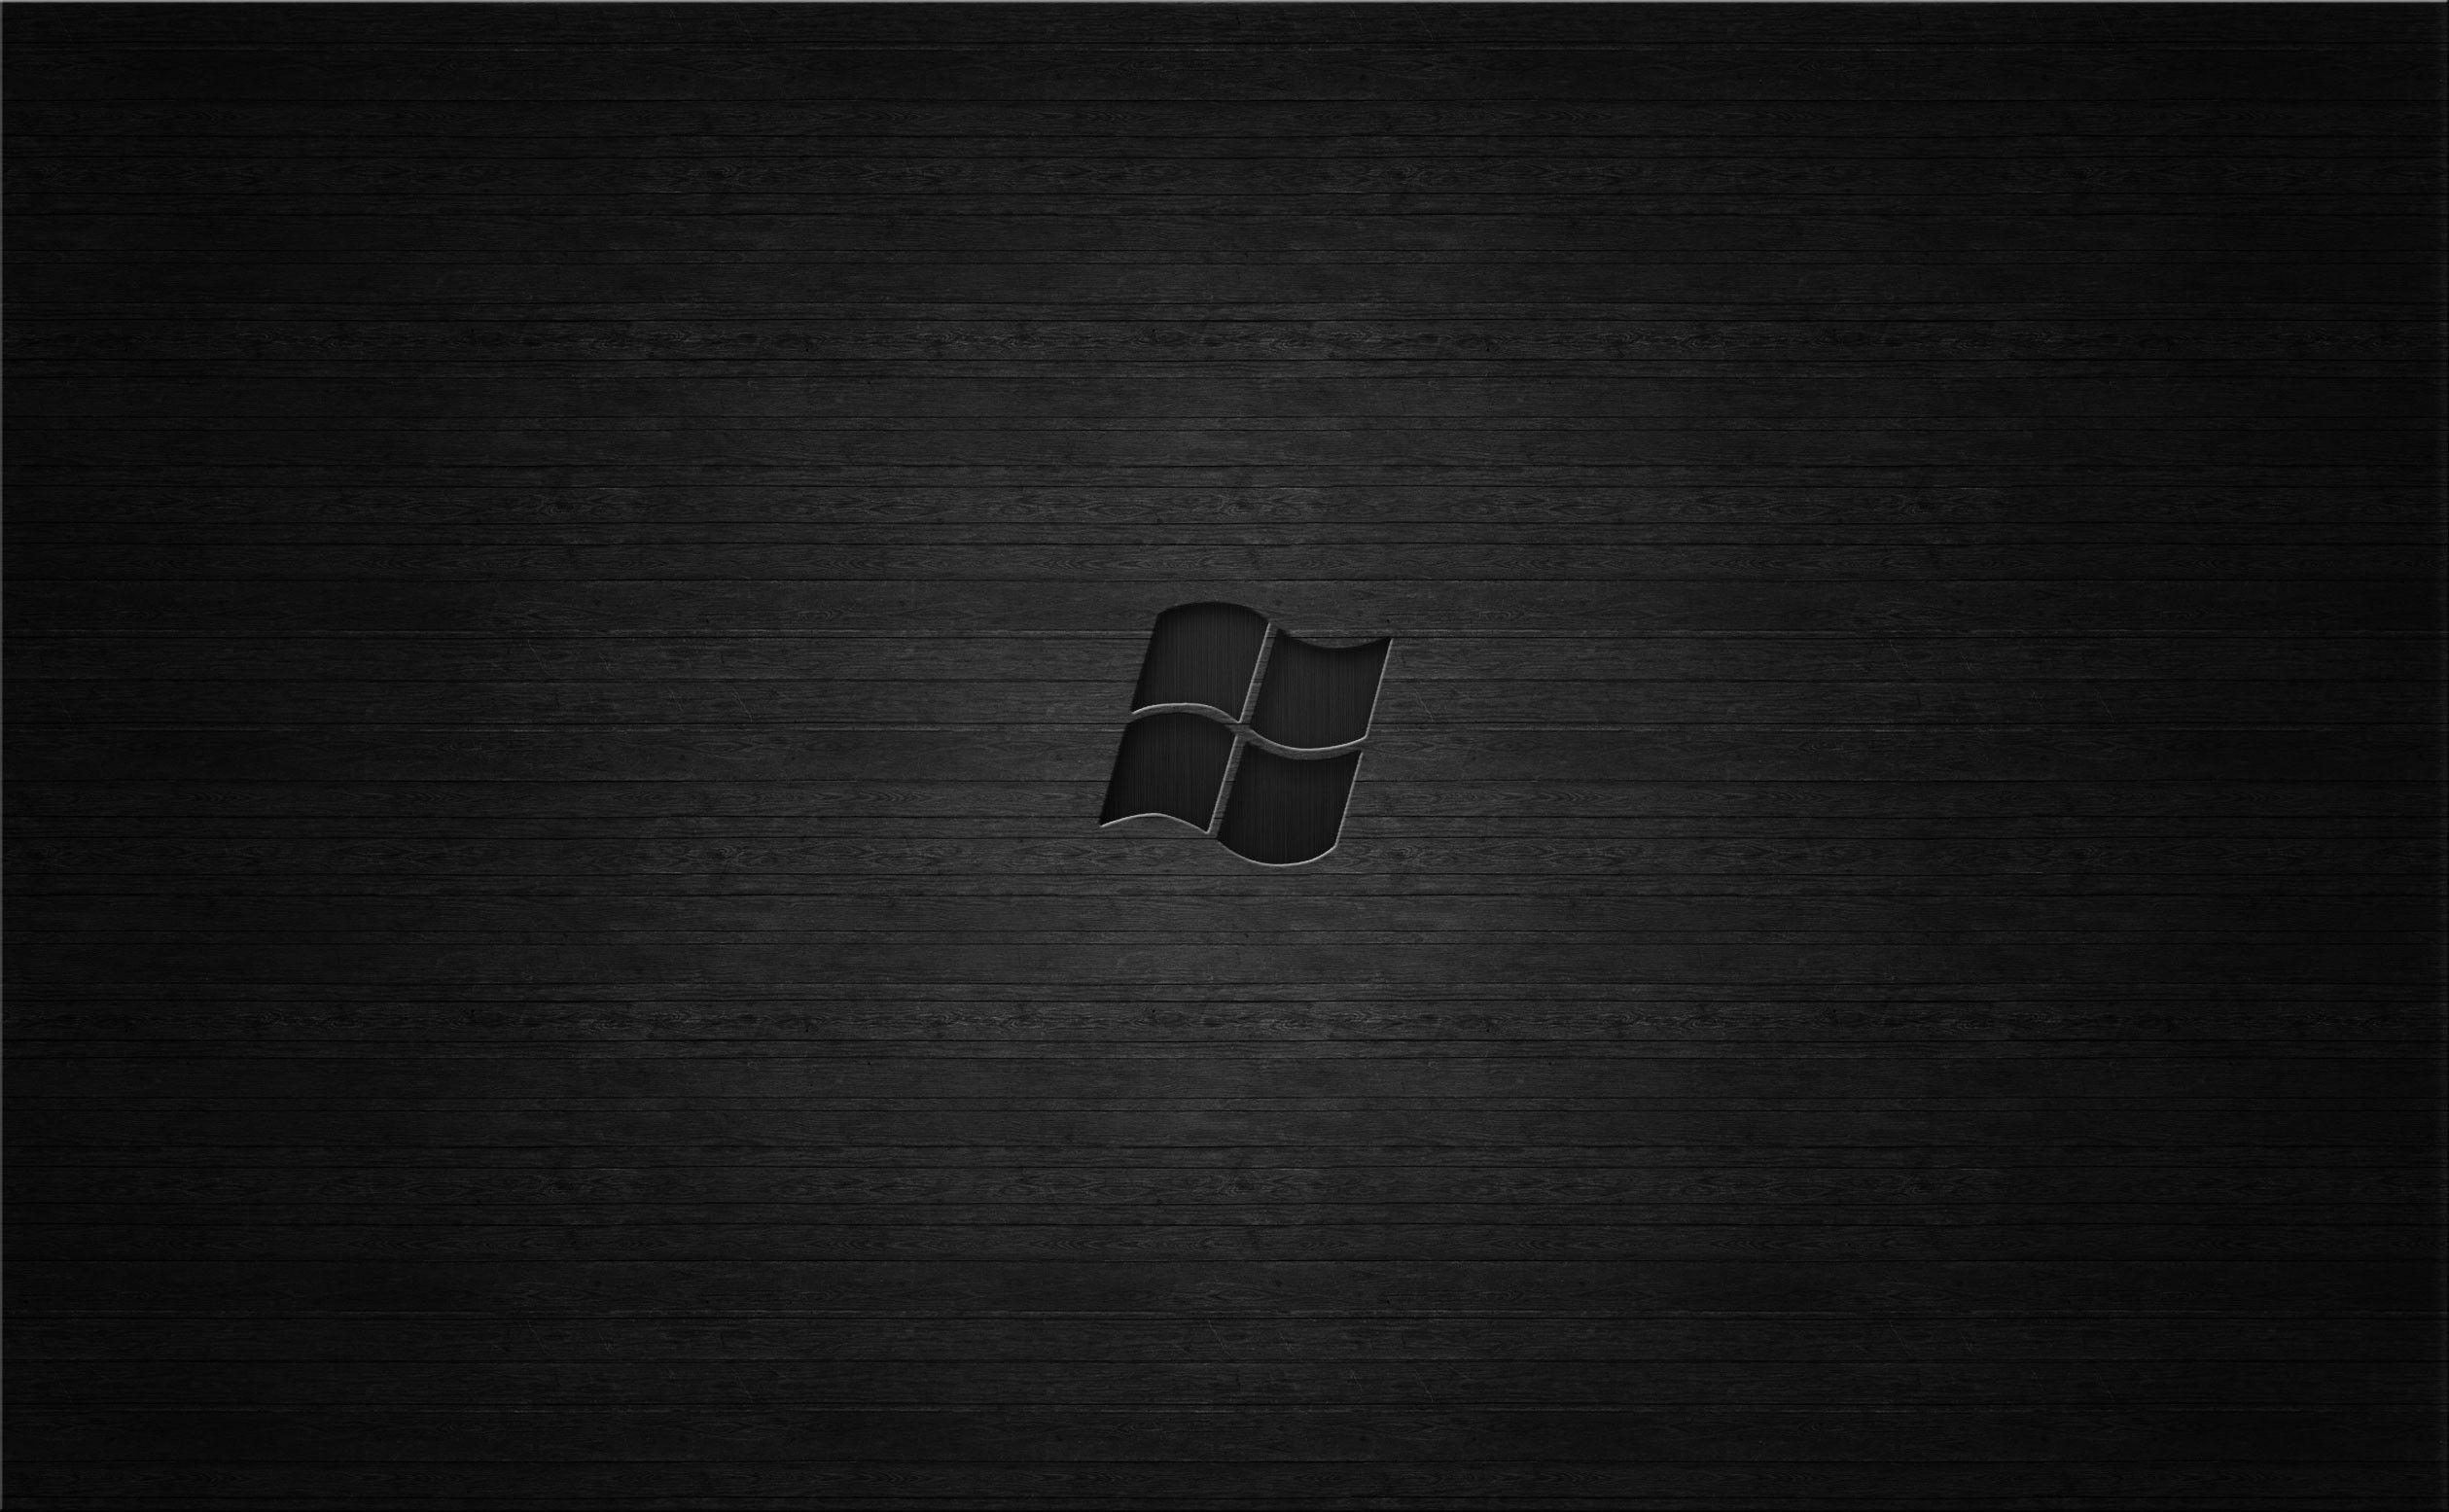 Black Windows Wallpaper 1080p: 10 New Windows Wallpaper Hd Black FULL HD 1080p For PC